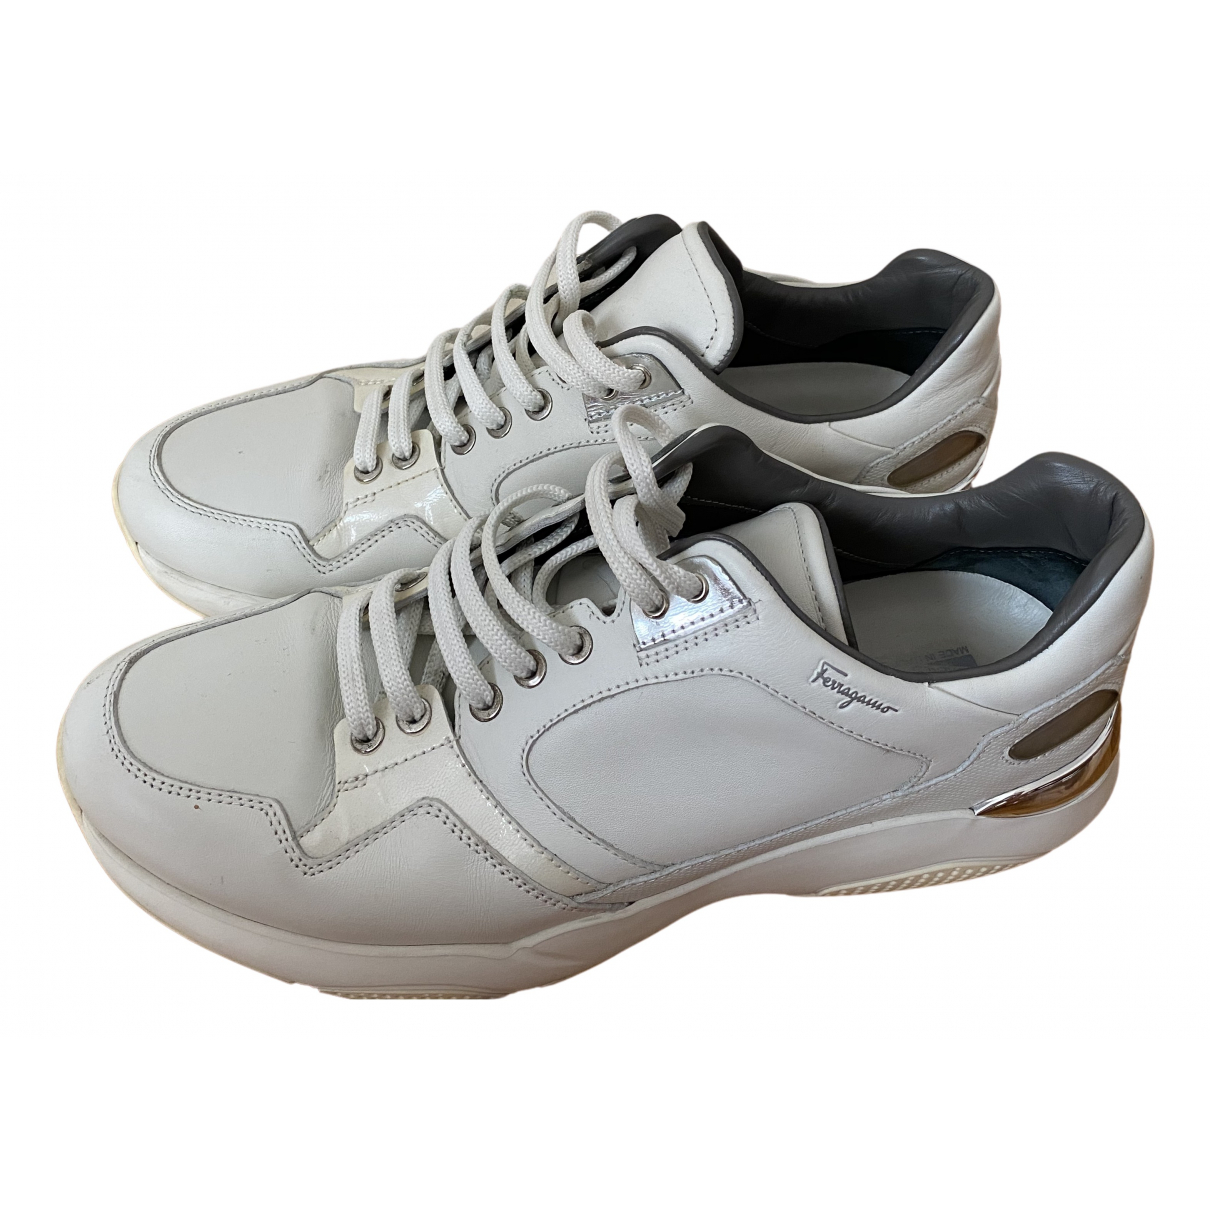 Salvatore Ferragamo \N Sneakers in  Weiss Leder